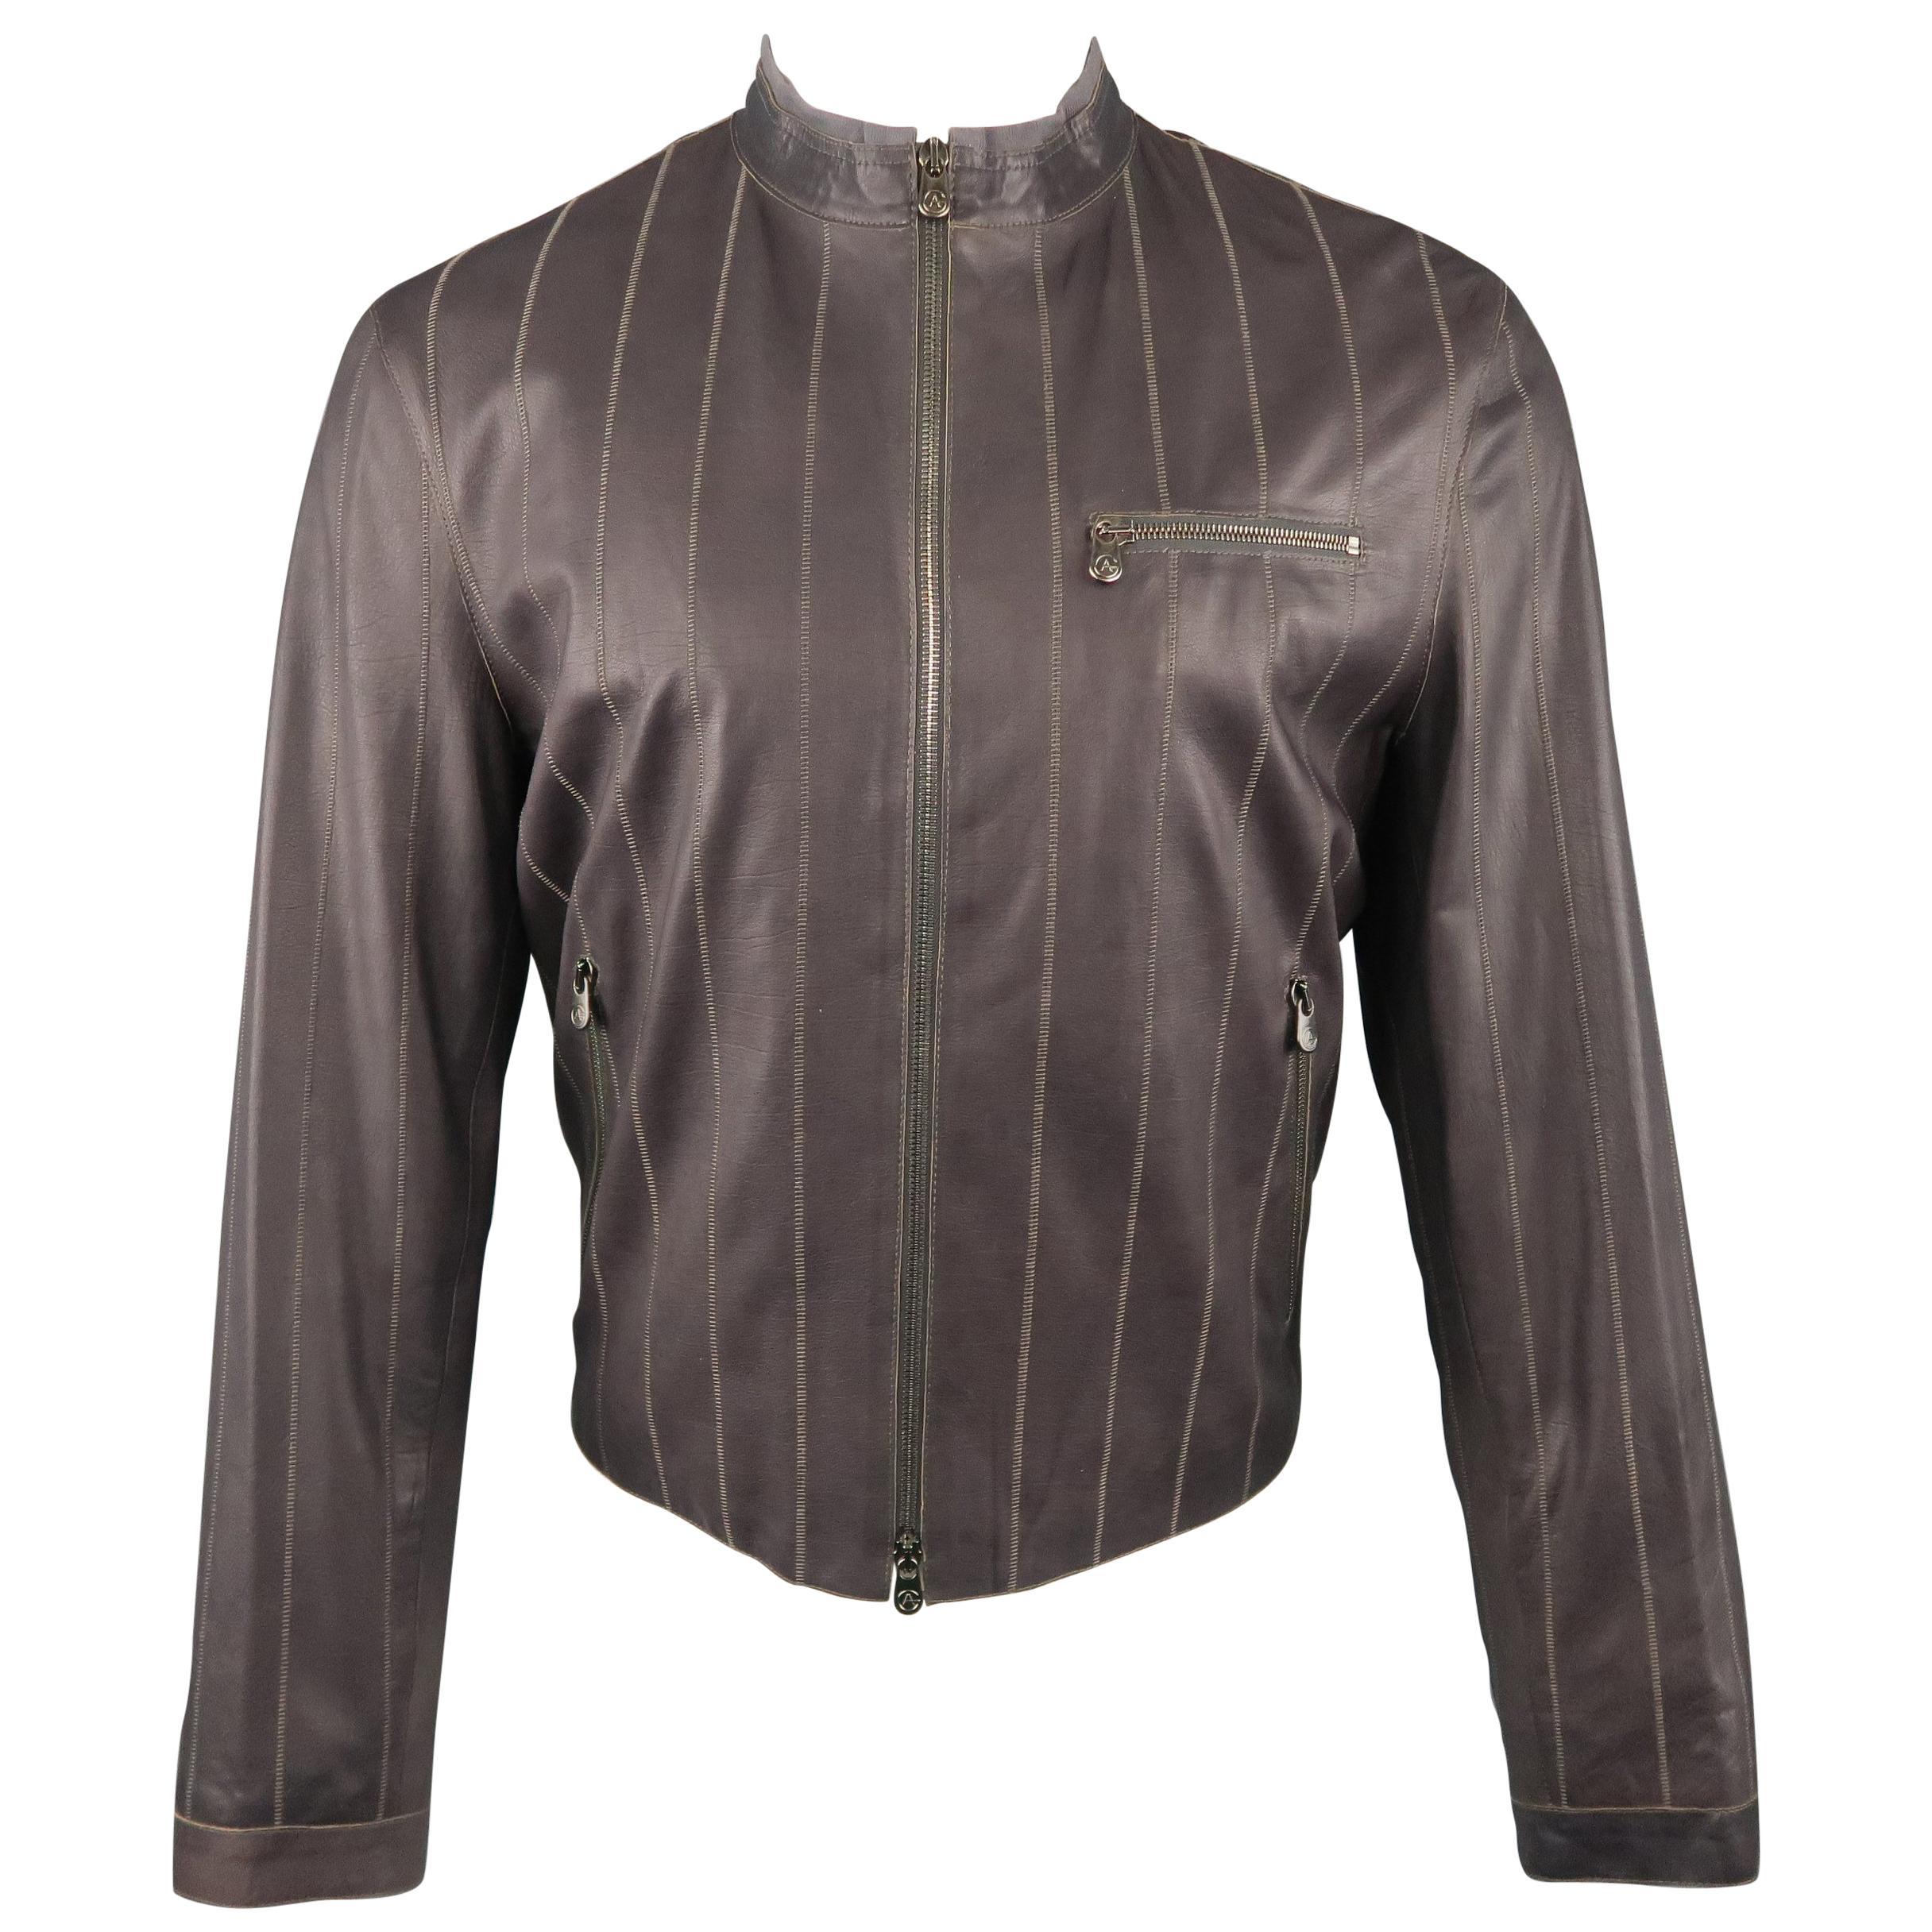 7ba4619a37d2 Vintage Giorgio Armani Jackets - 89 For Sale at 1stdibs